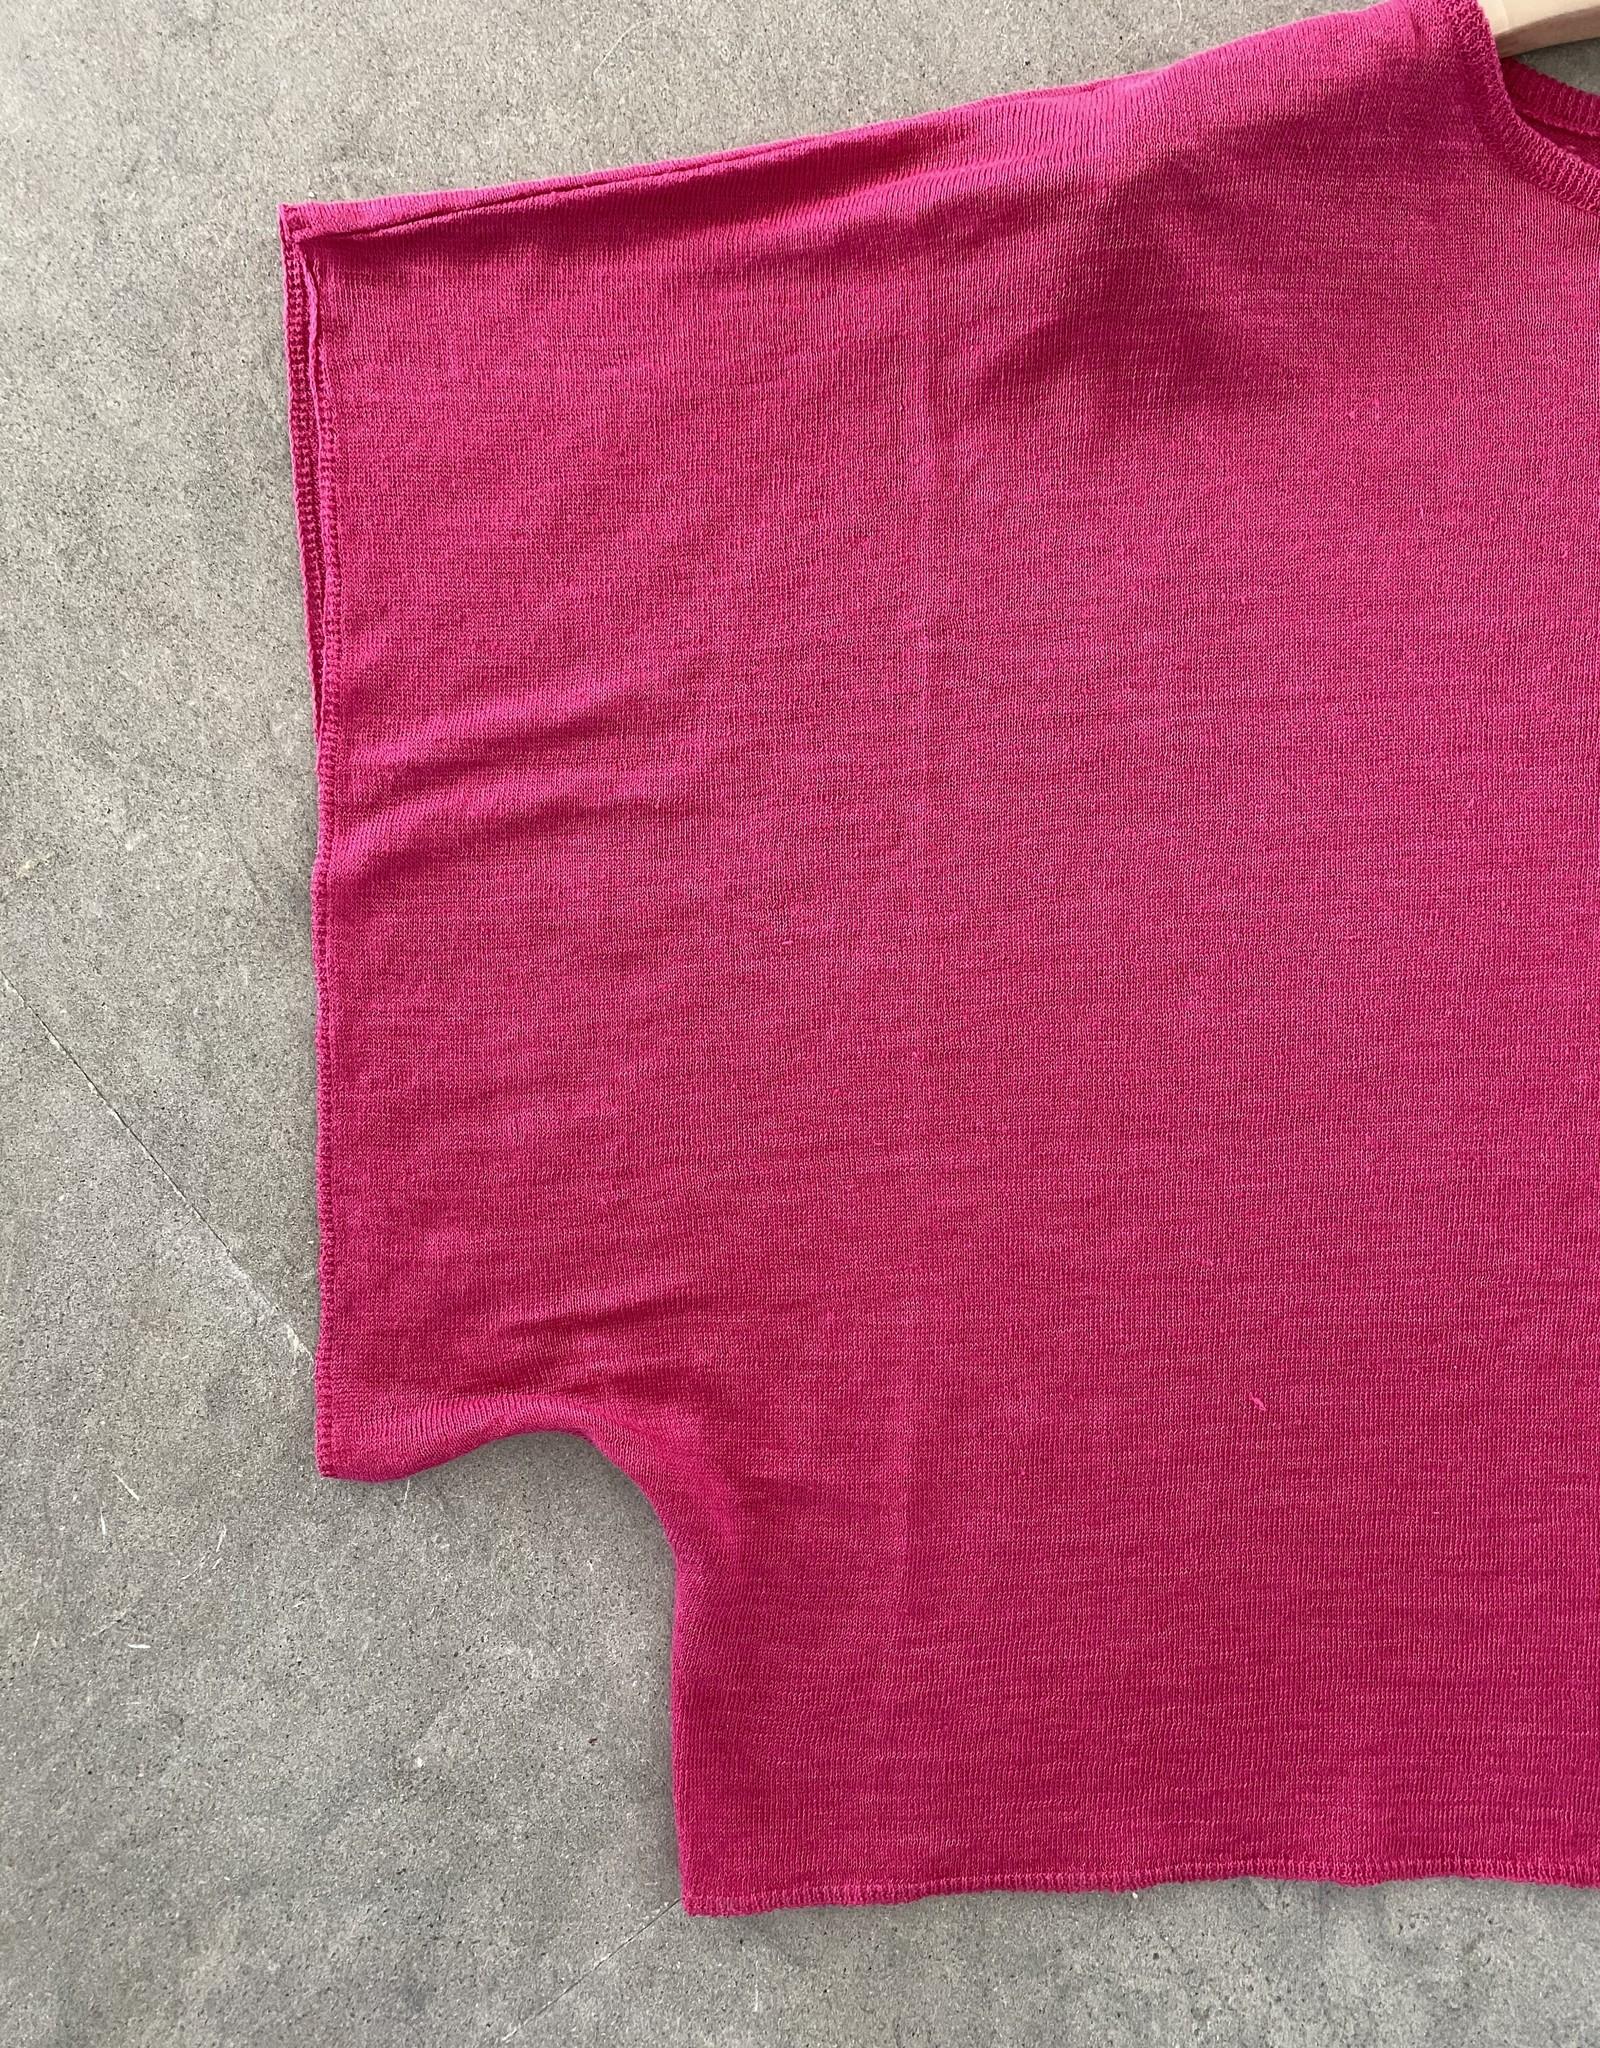 ICHI Antiquités ICHI #954 Linen Knit Pullover